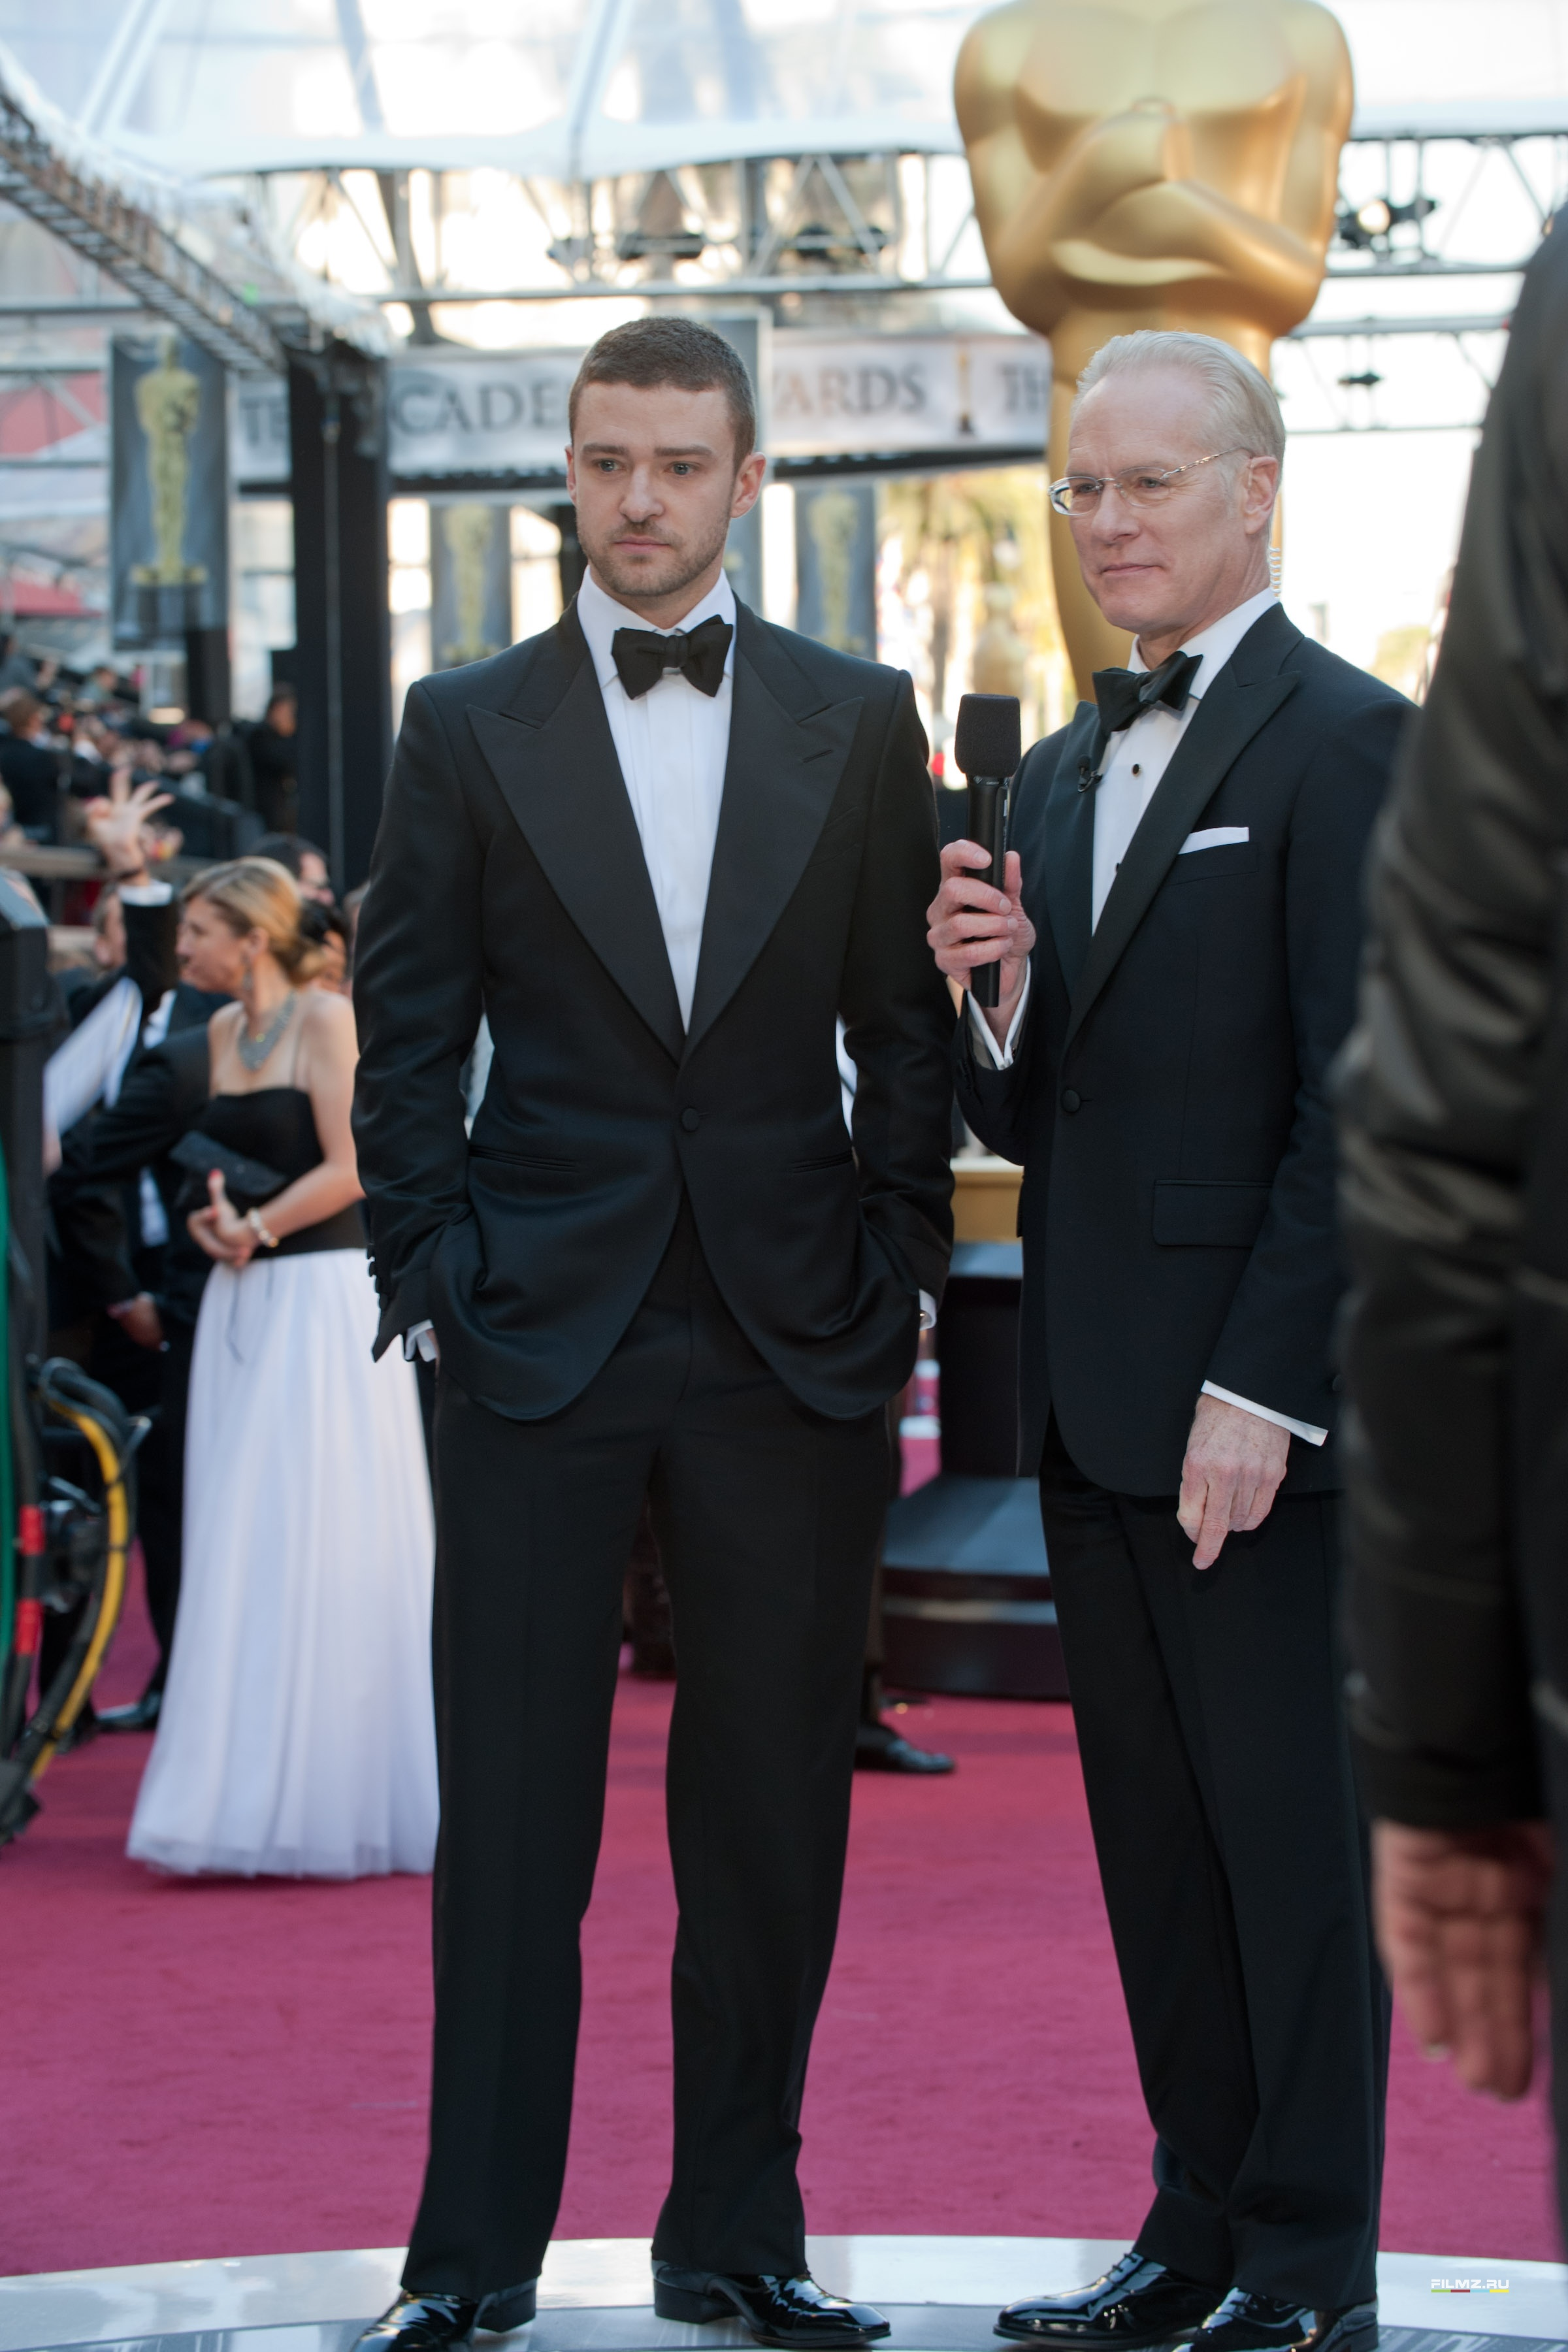 звездная дорожка Оскар 2011 Джастин Тимберлейк,